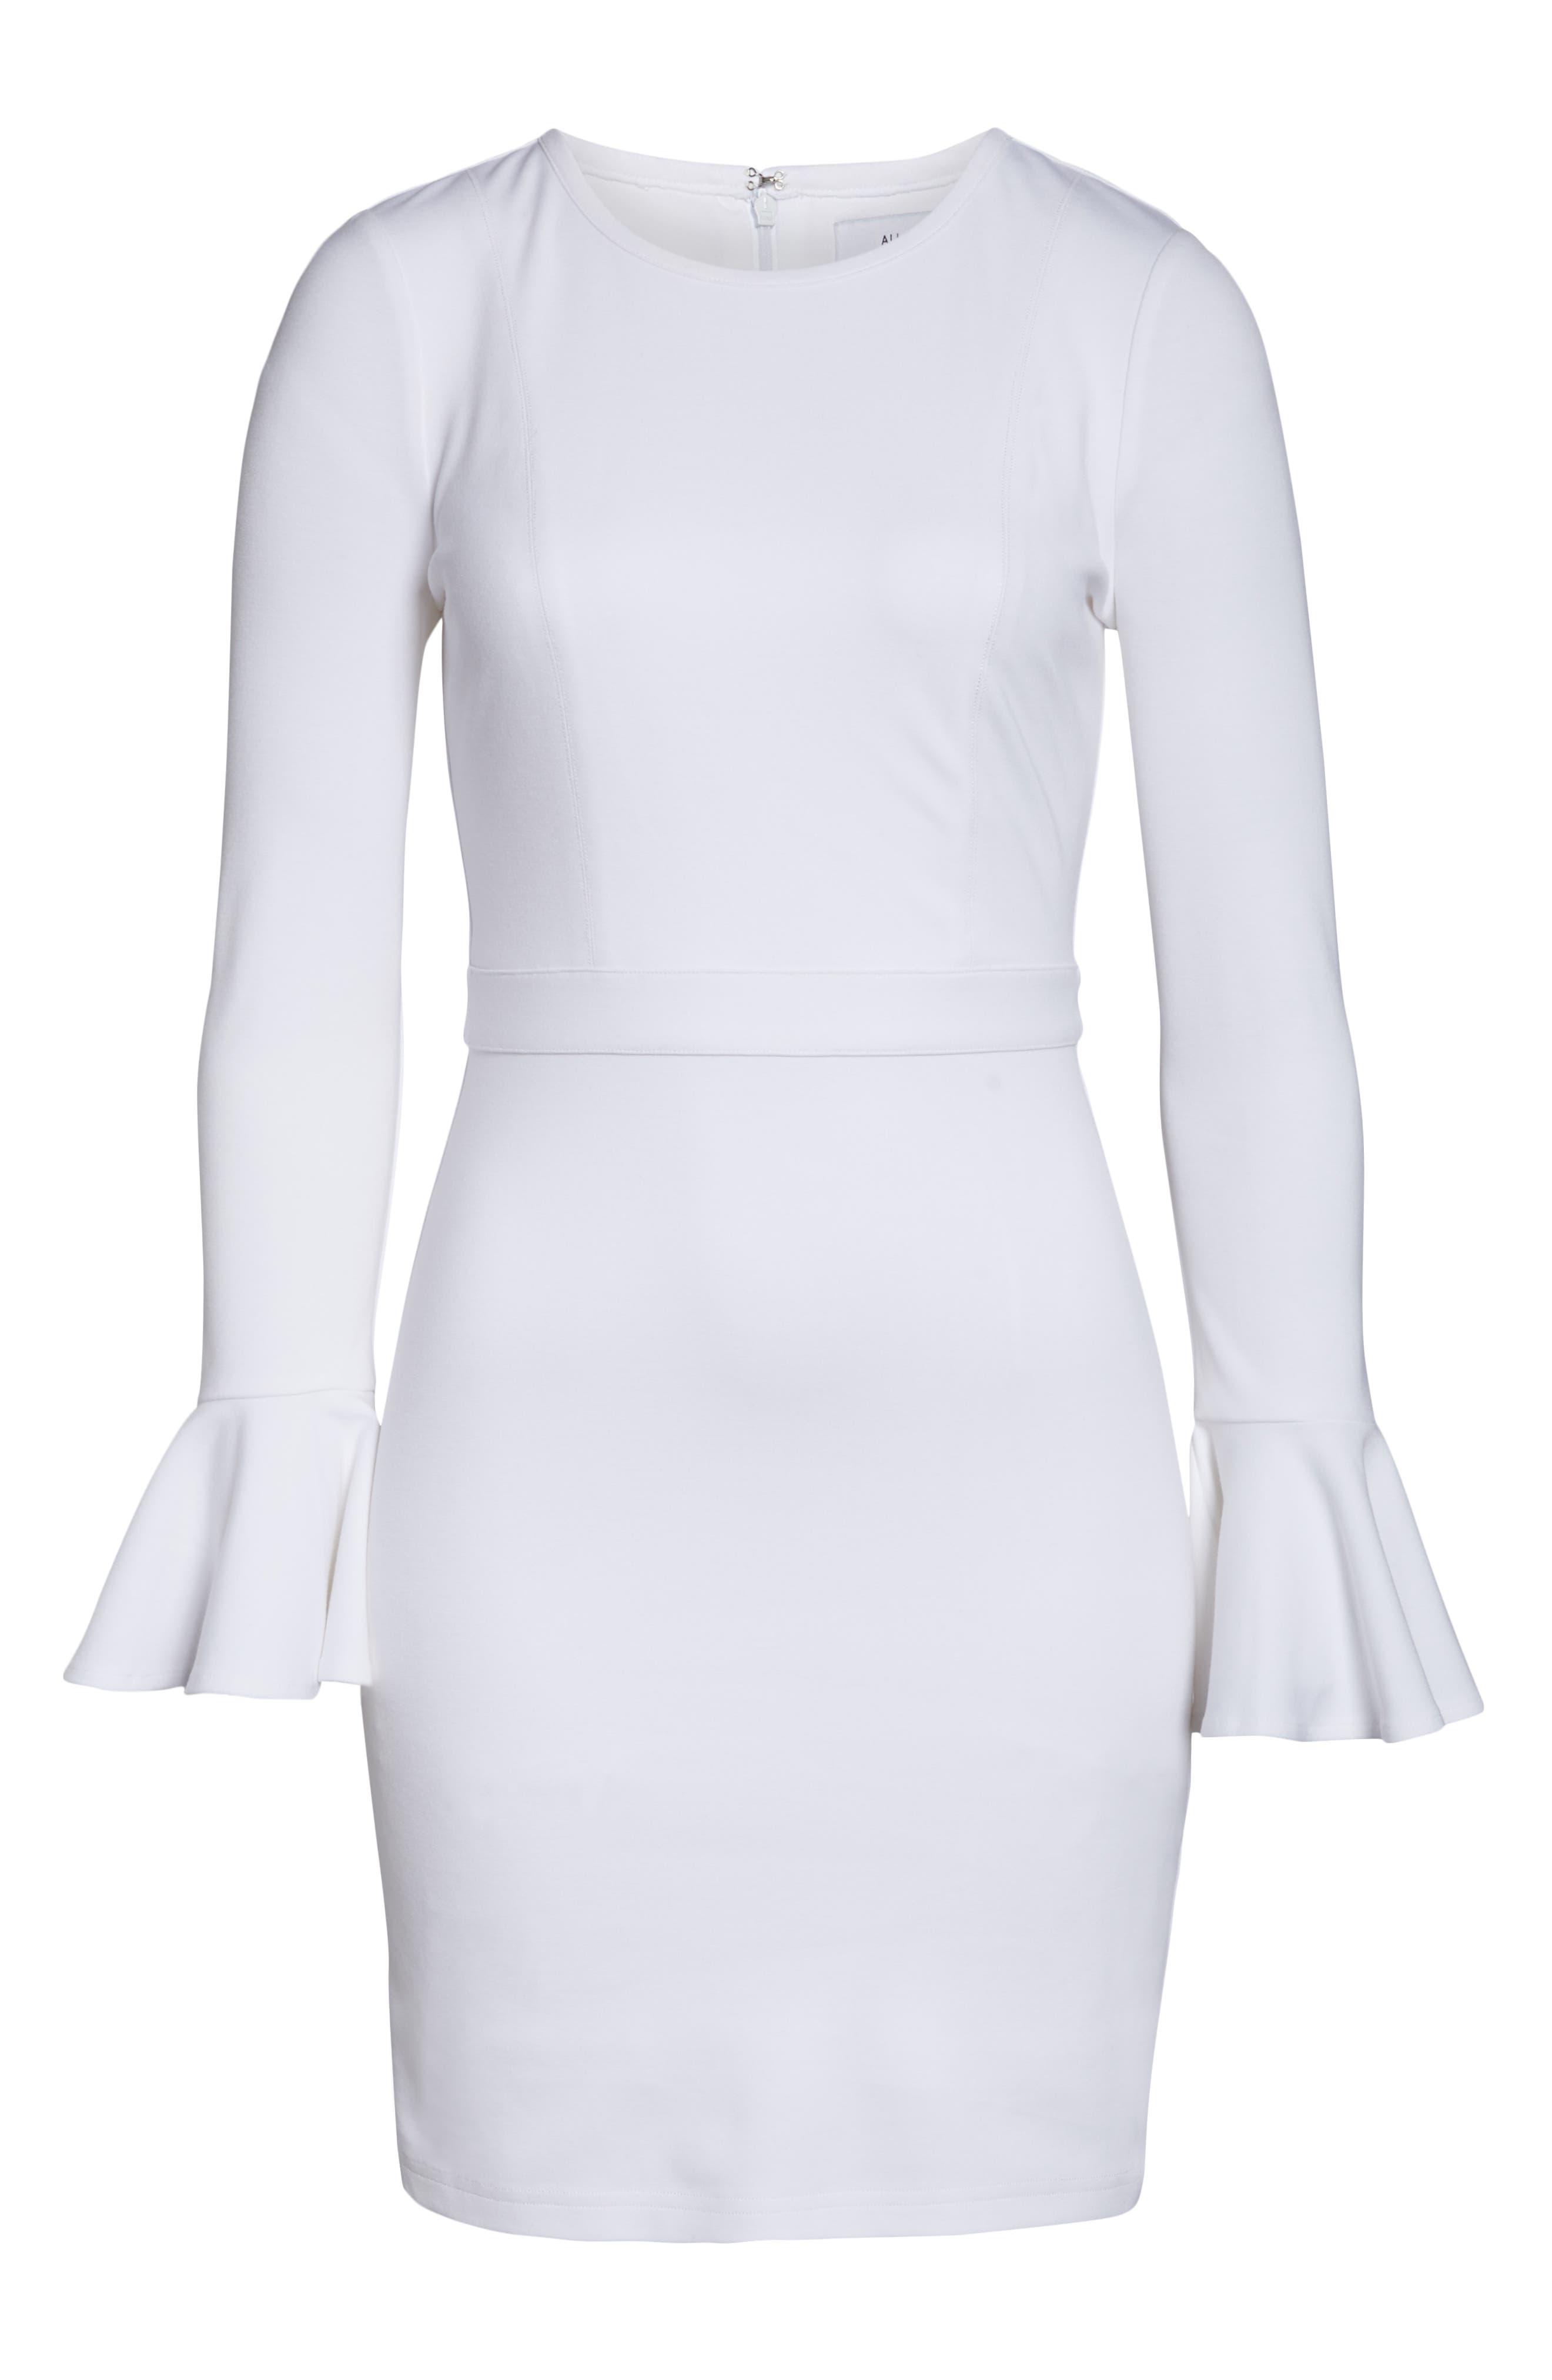 ALI & JAY, Pavillion Bell Cuff Sheath Dress, Alternate thumbnail 7, color, WHITE